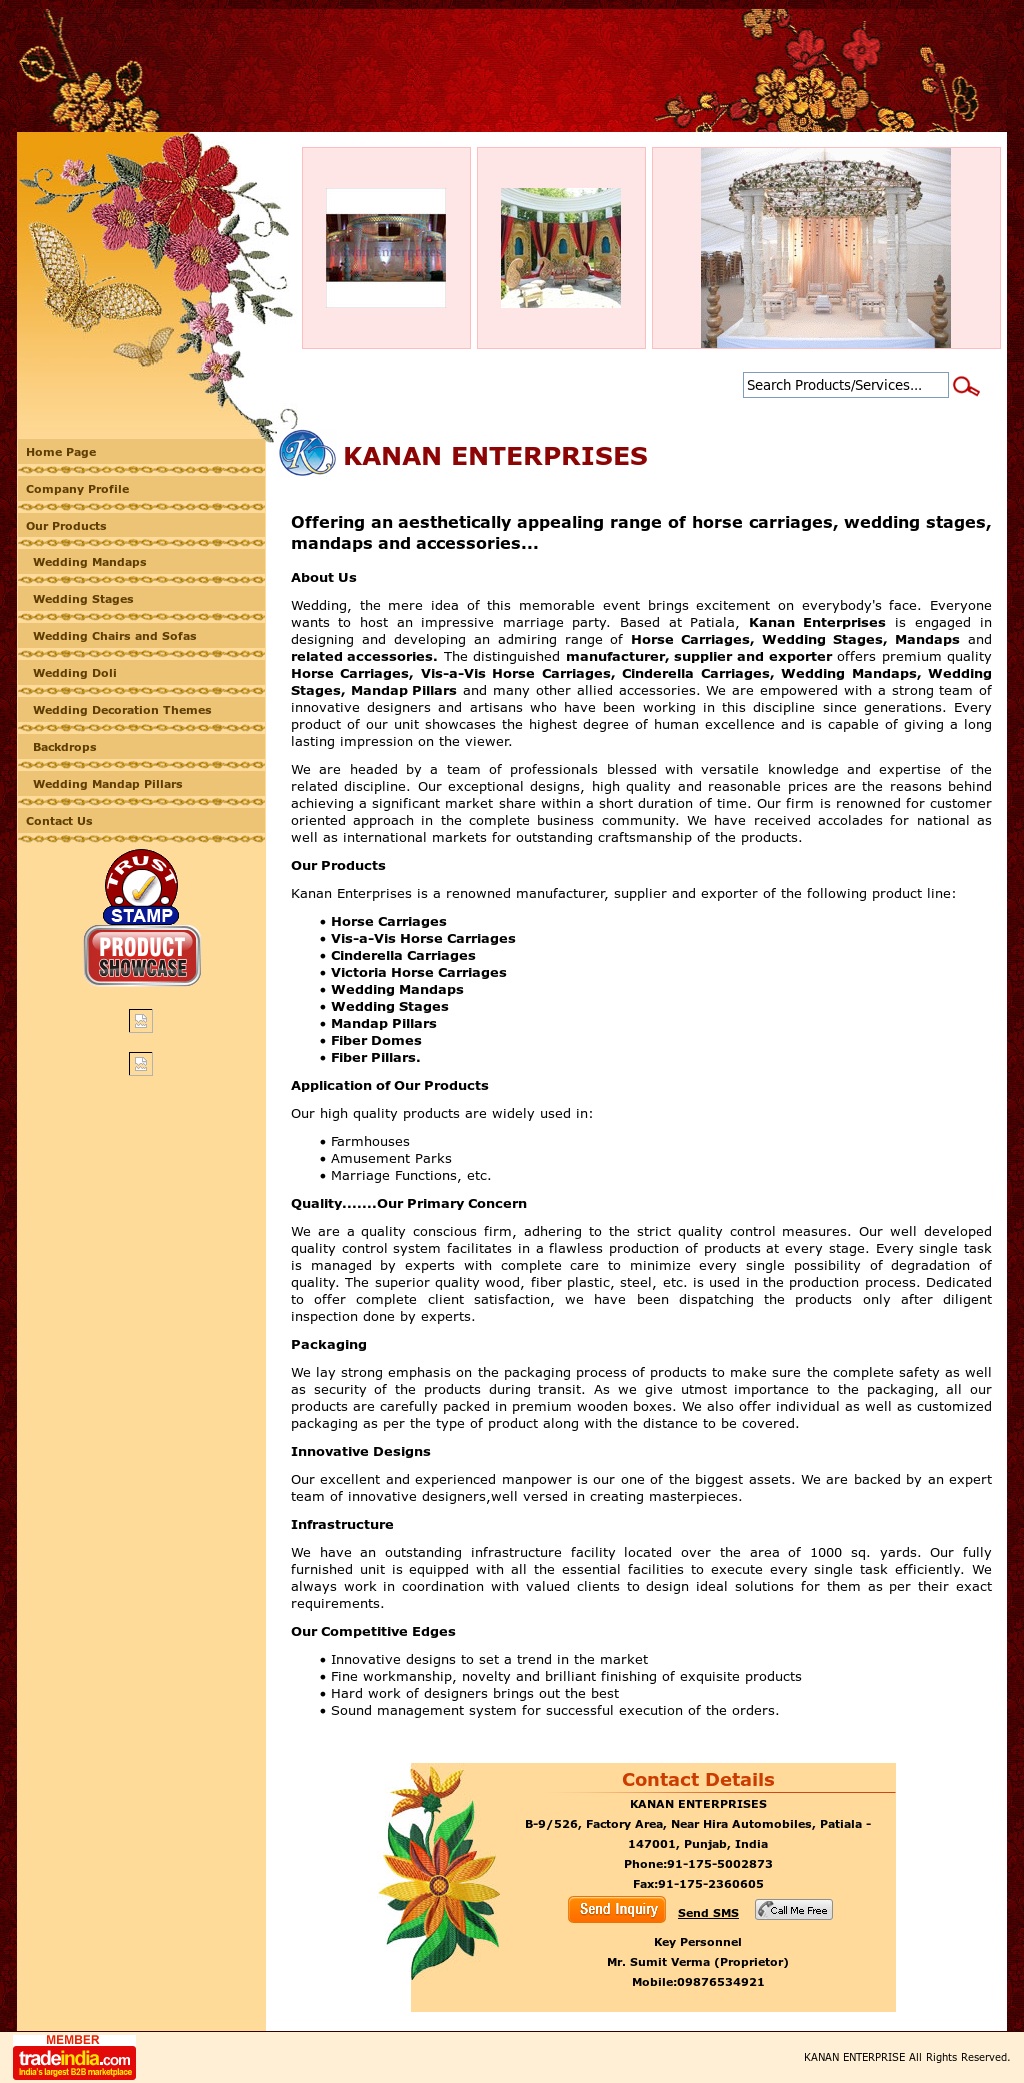 Kanan Enterprise Competitors, Revenue and Employees - Owler Company